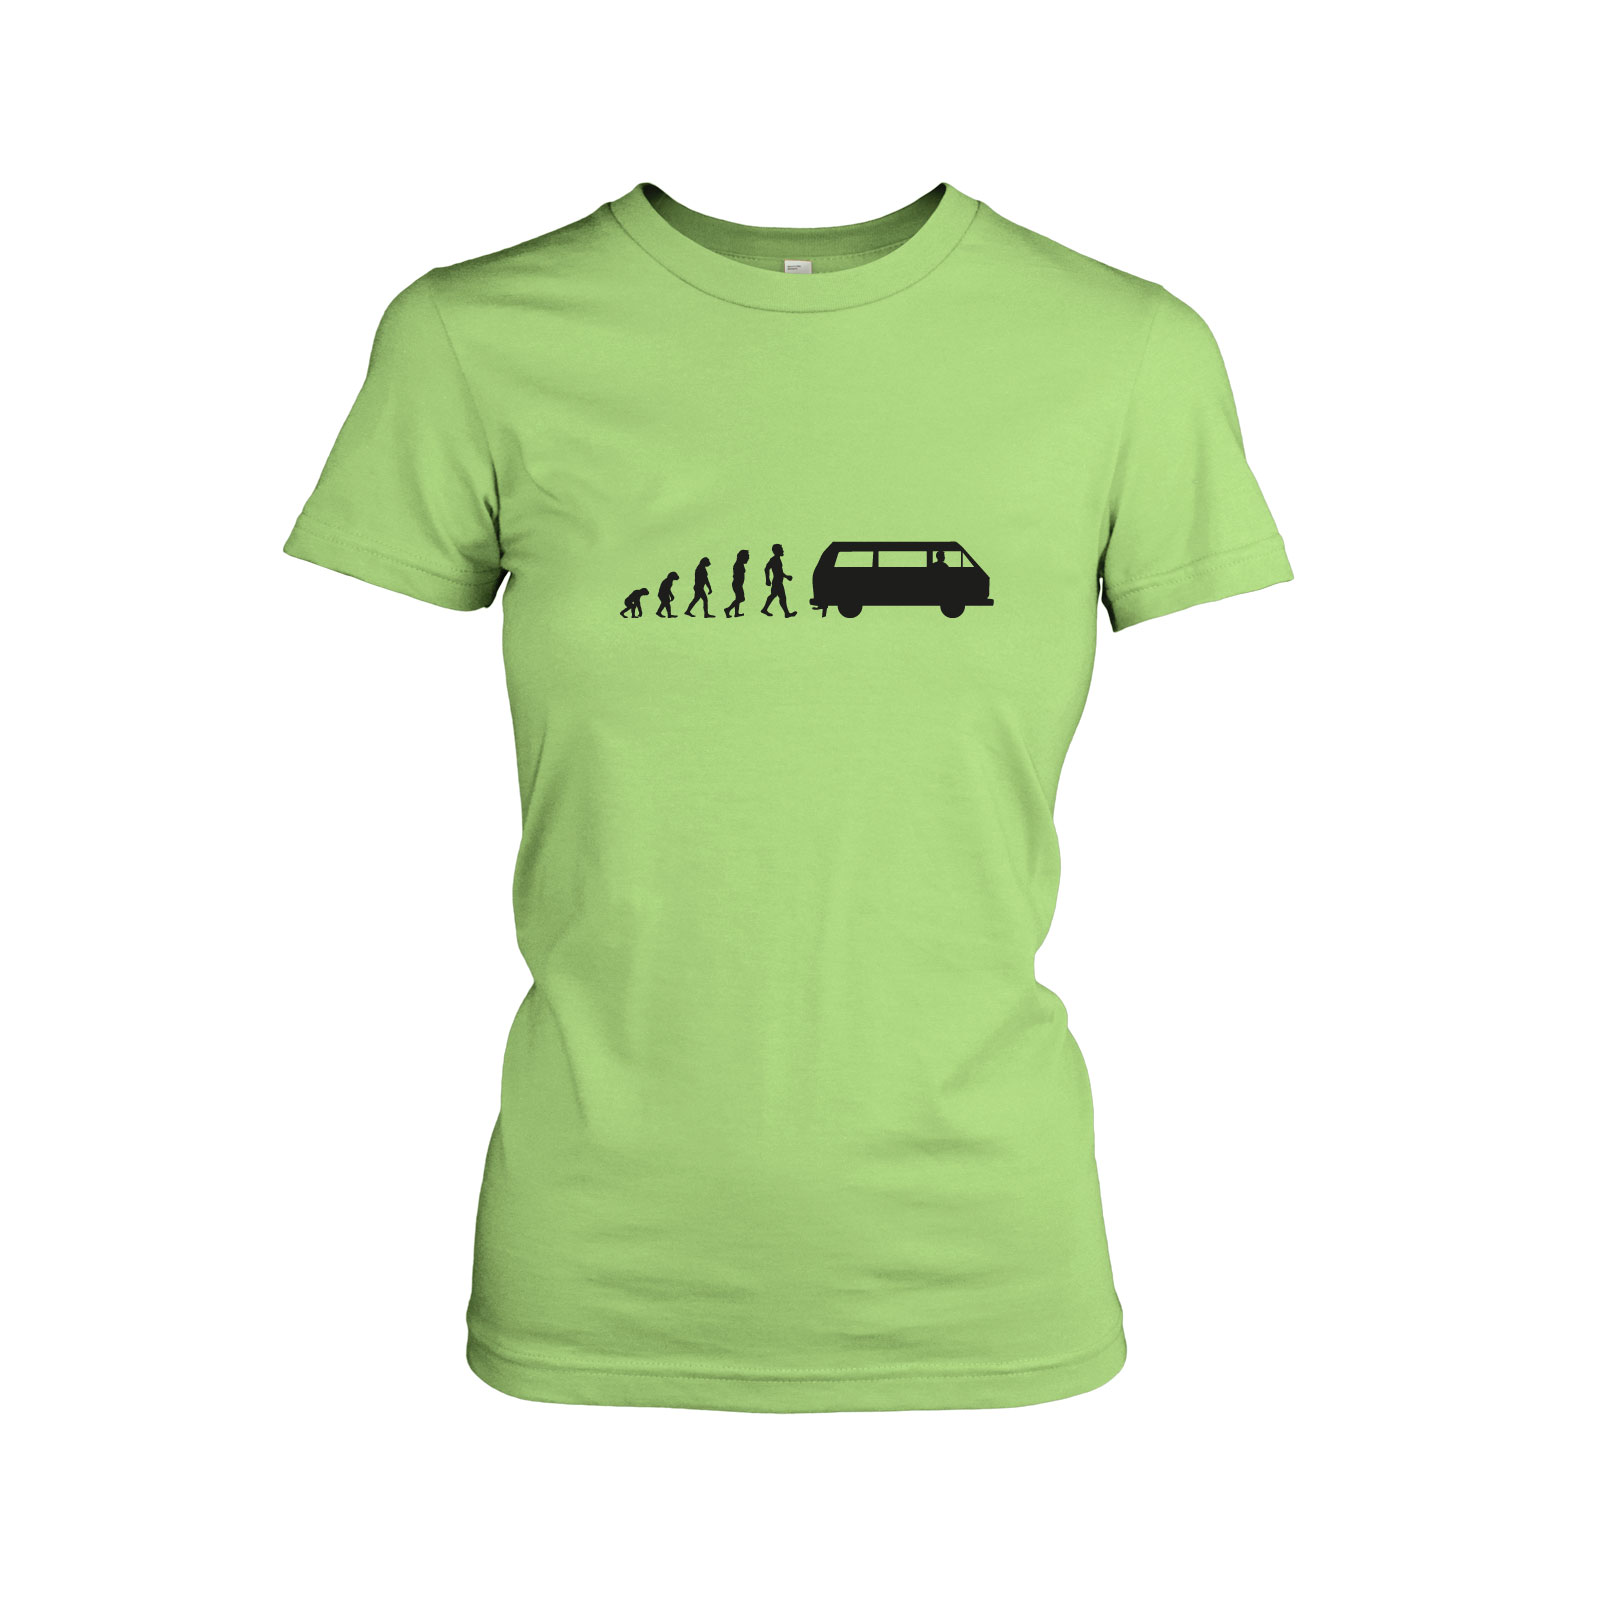 bulli t3 evolution damen t shirt bus wagen sommer surfen ebay. Black Bedroom Furniture Sets. Home Design Ideas